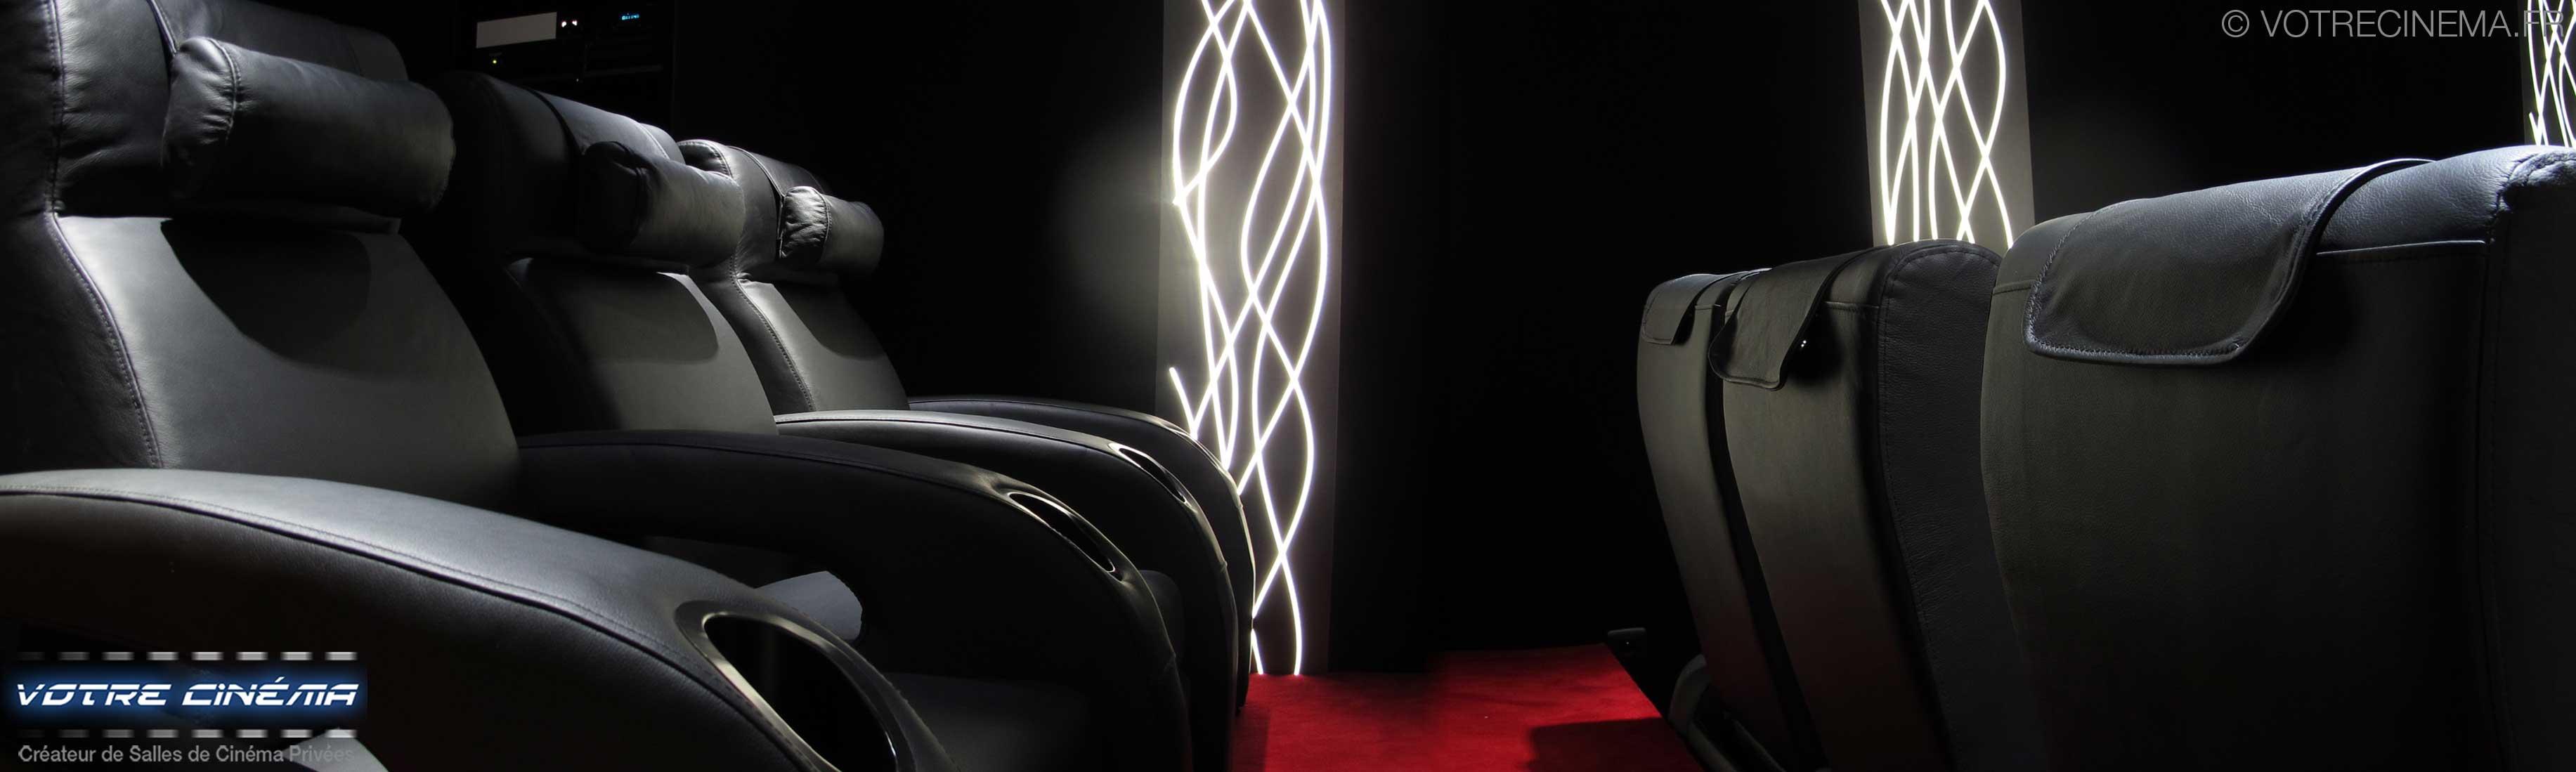 Salle home cinéma privée  Valence